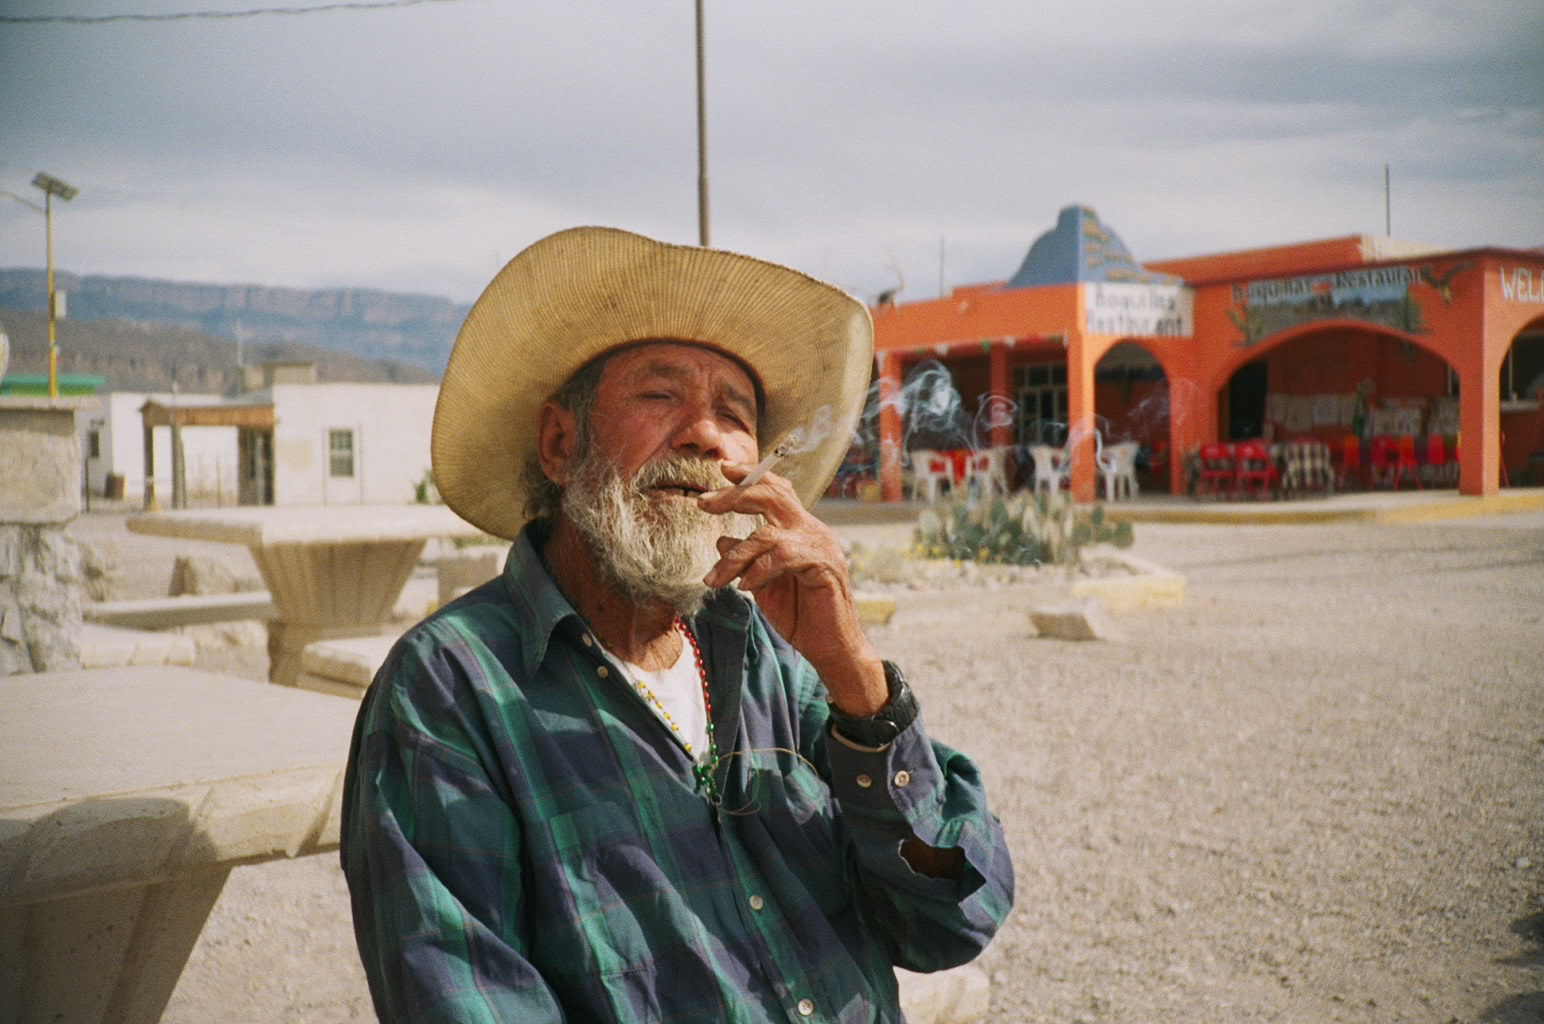 Wise man, Boquillas, Mexico, 2017